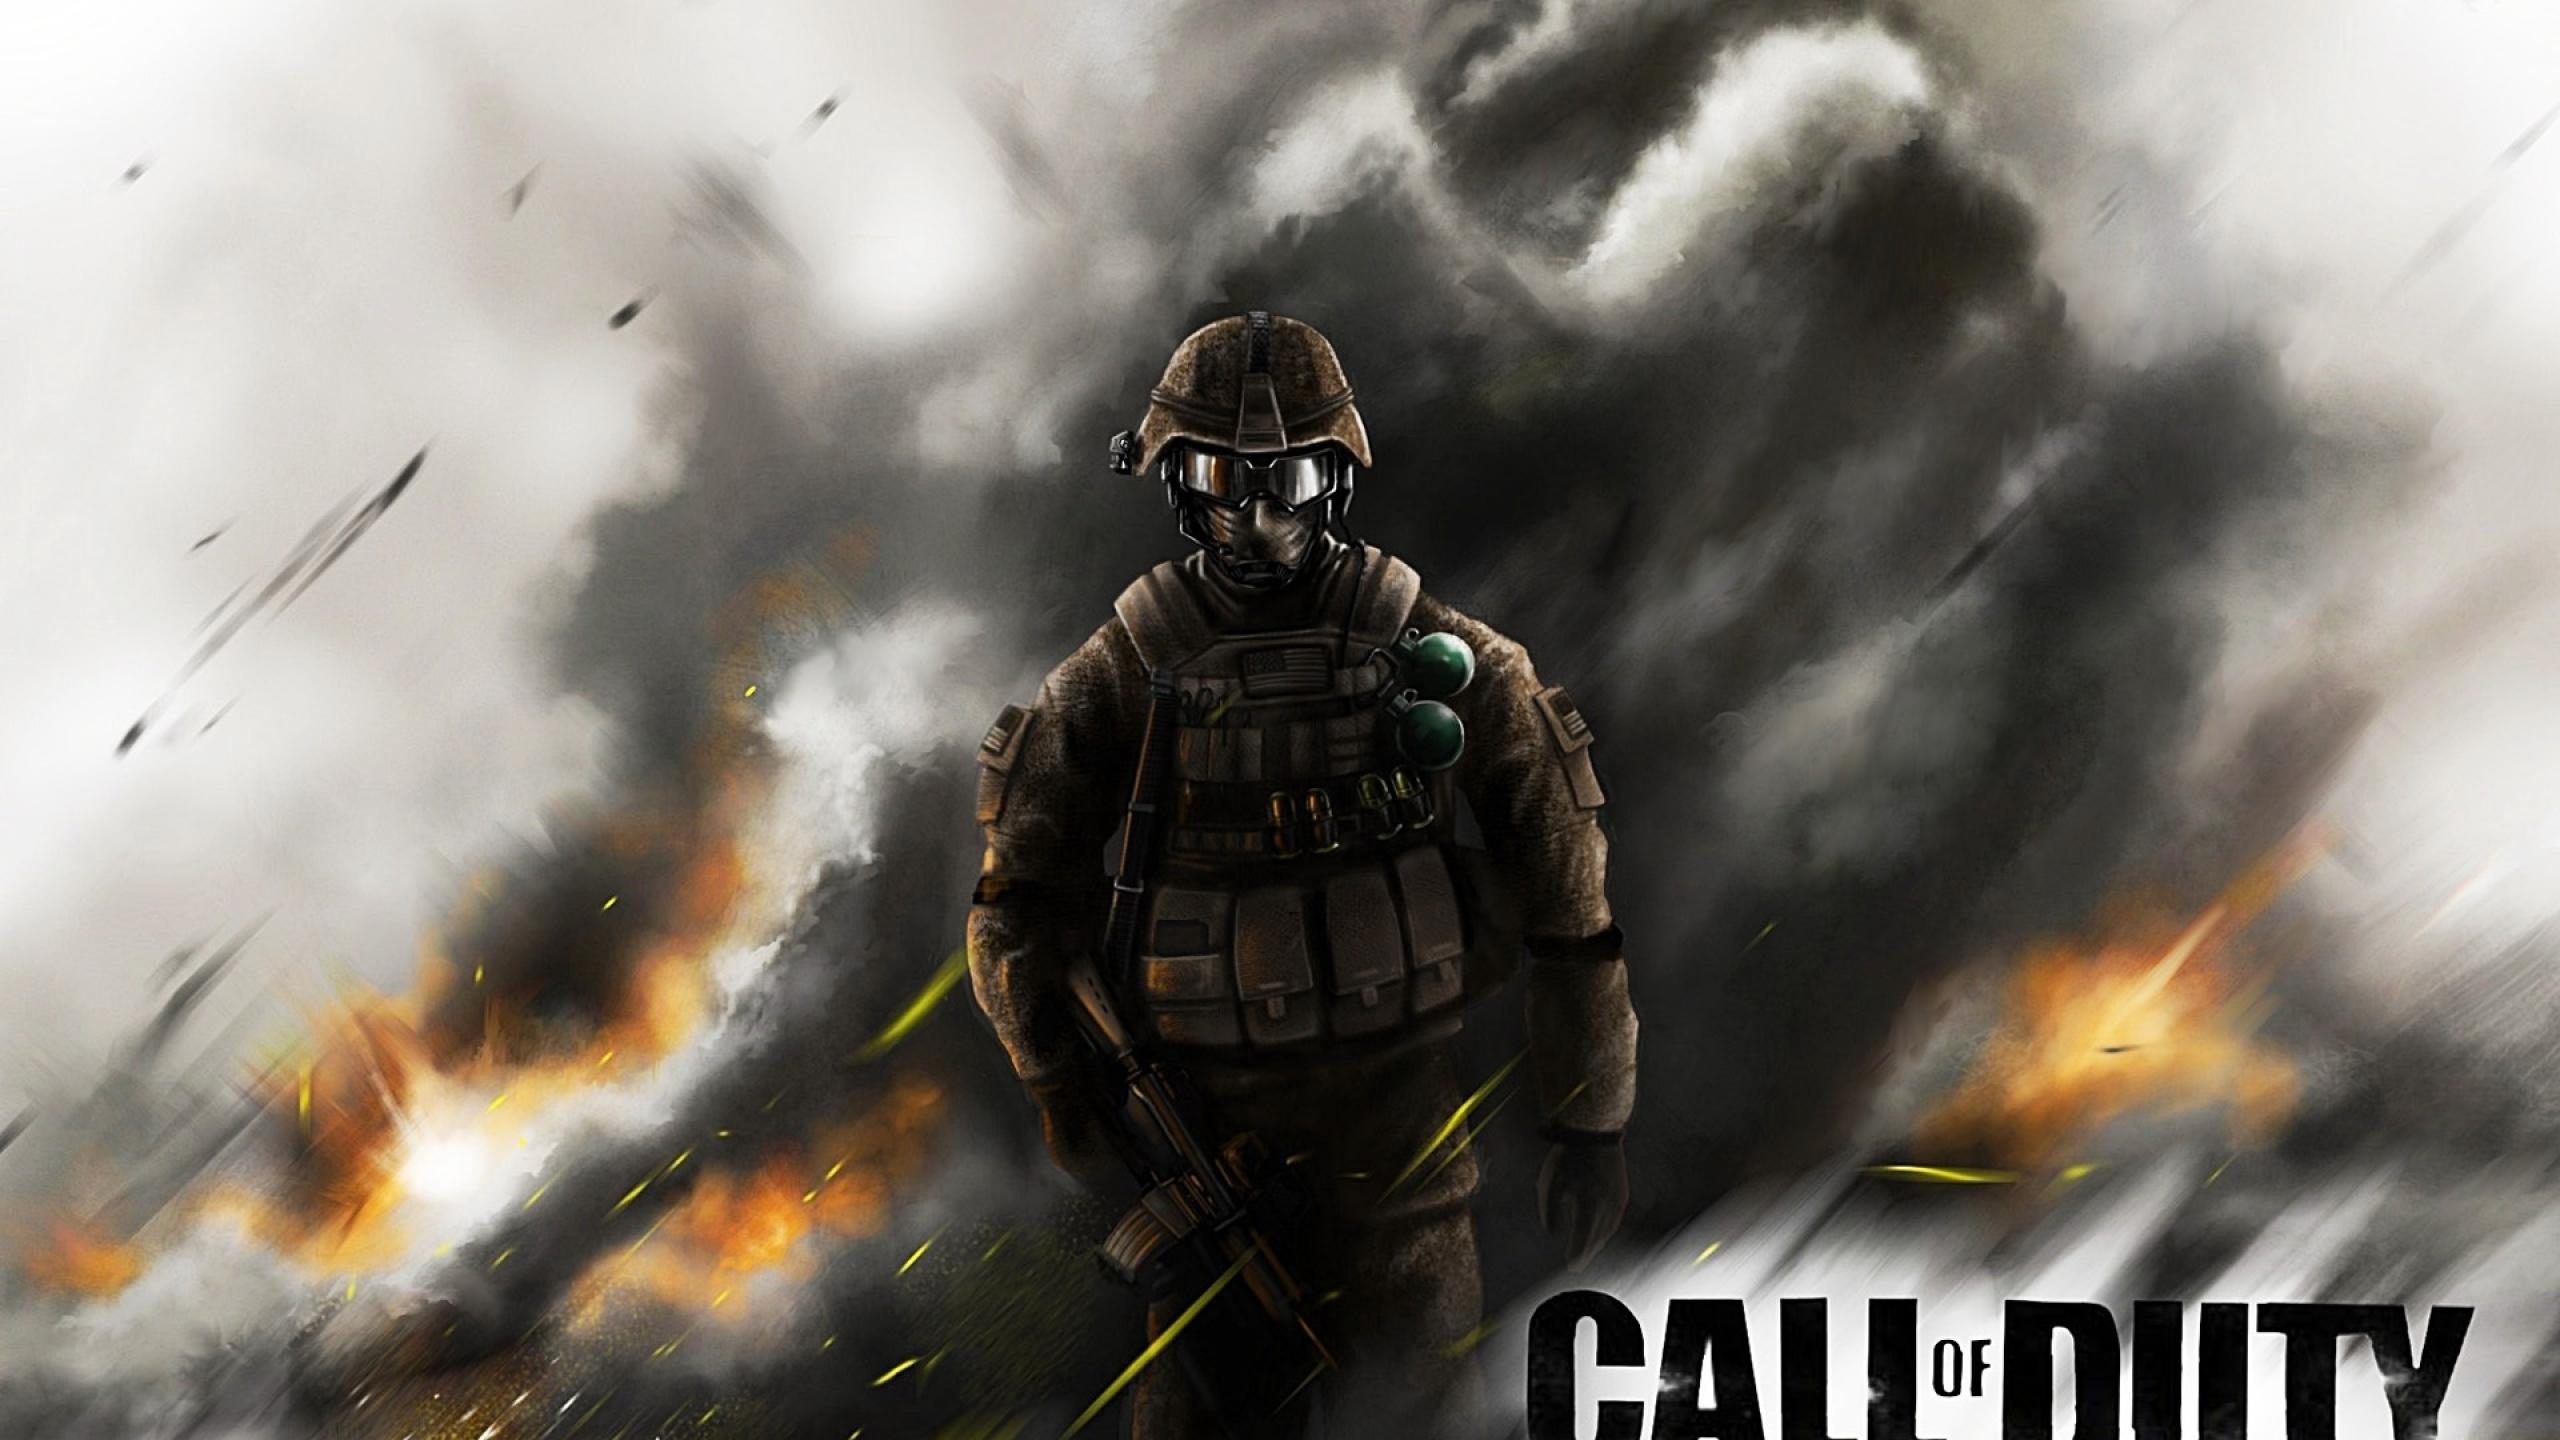 2560x1440 Call Of Duty Modern Warfare 3 Soldier 1440p Resolution